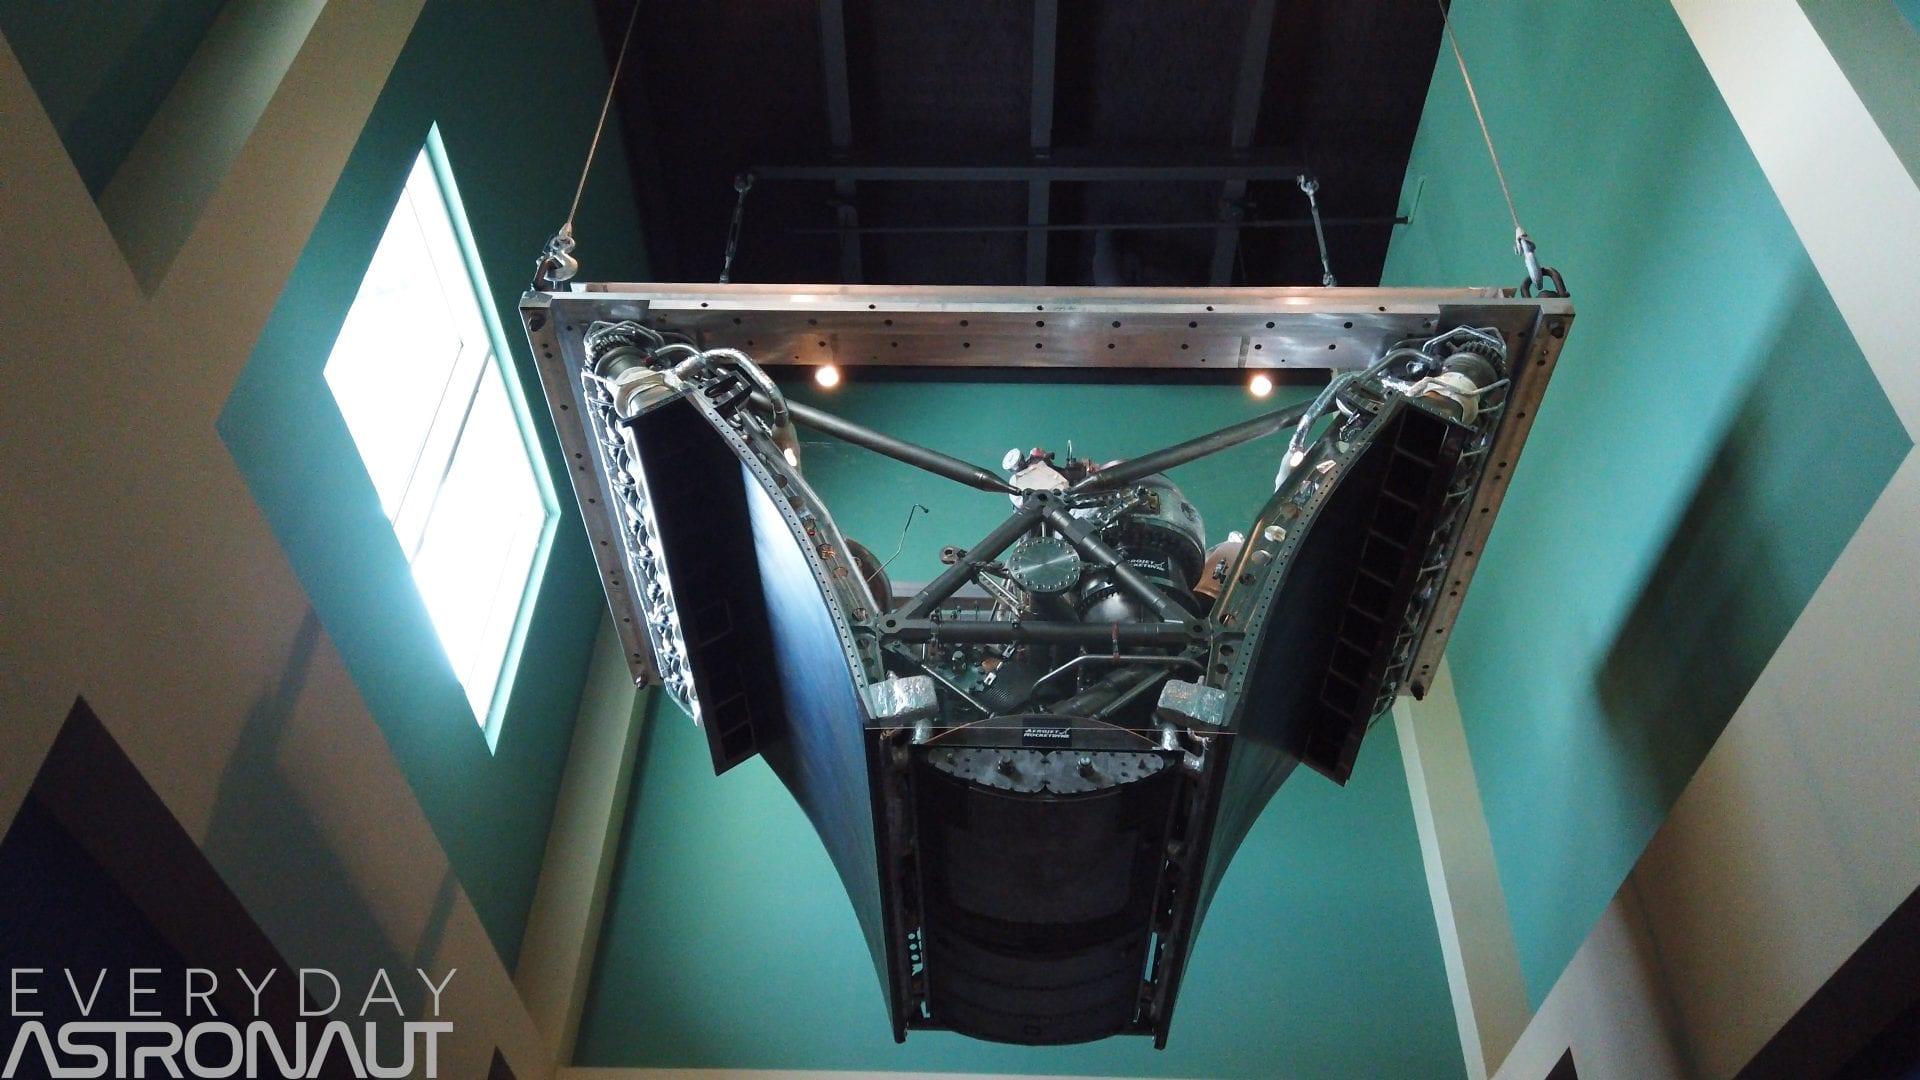 XRS-2200 Aerospike engine stennis infinity science center